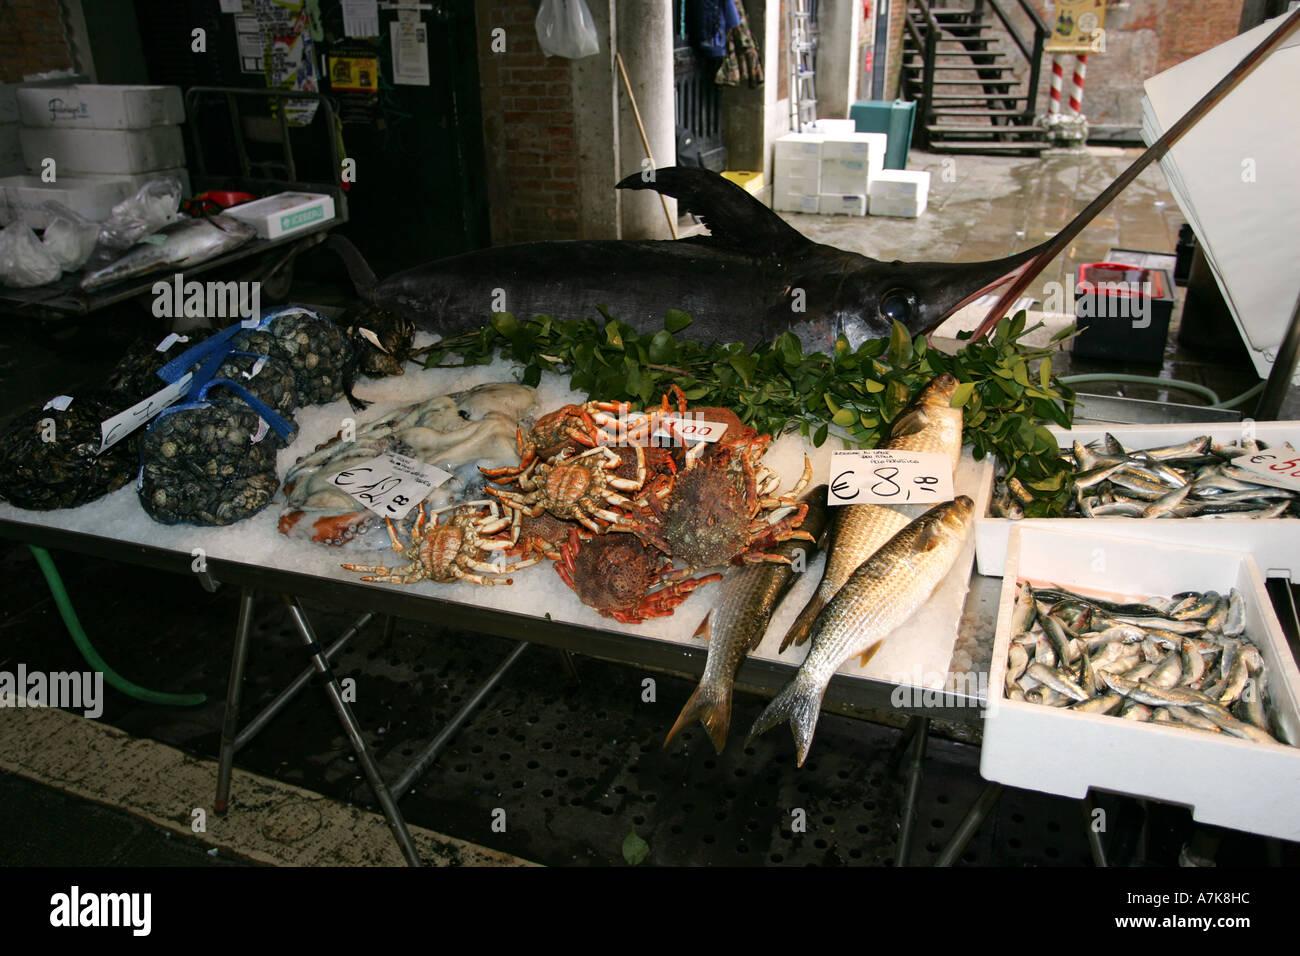 World famous fish market Prescaria near the Rialto Bridge, central Venice Italy Europe popular with tourists Stock Photo